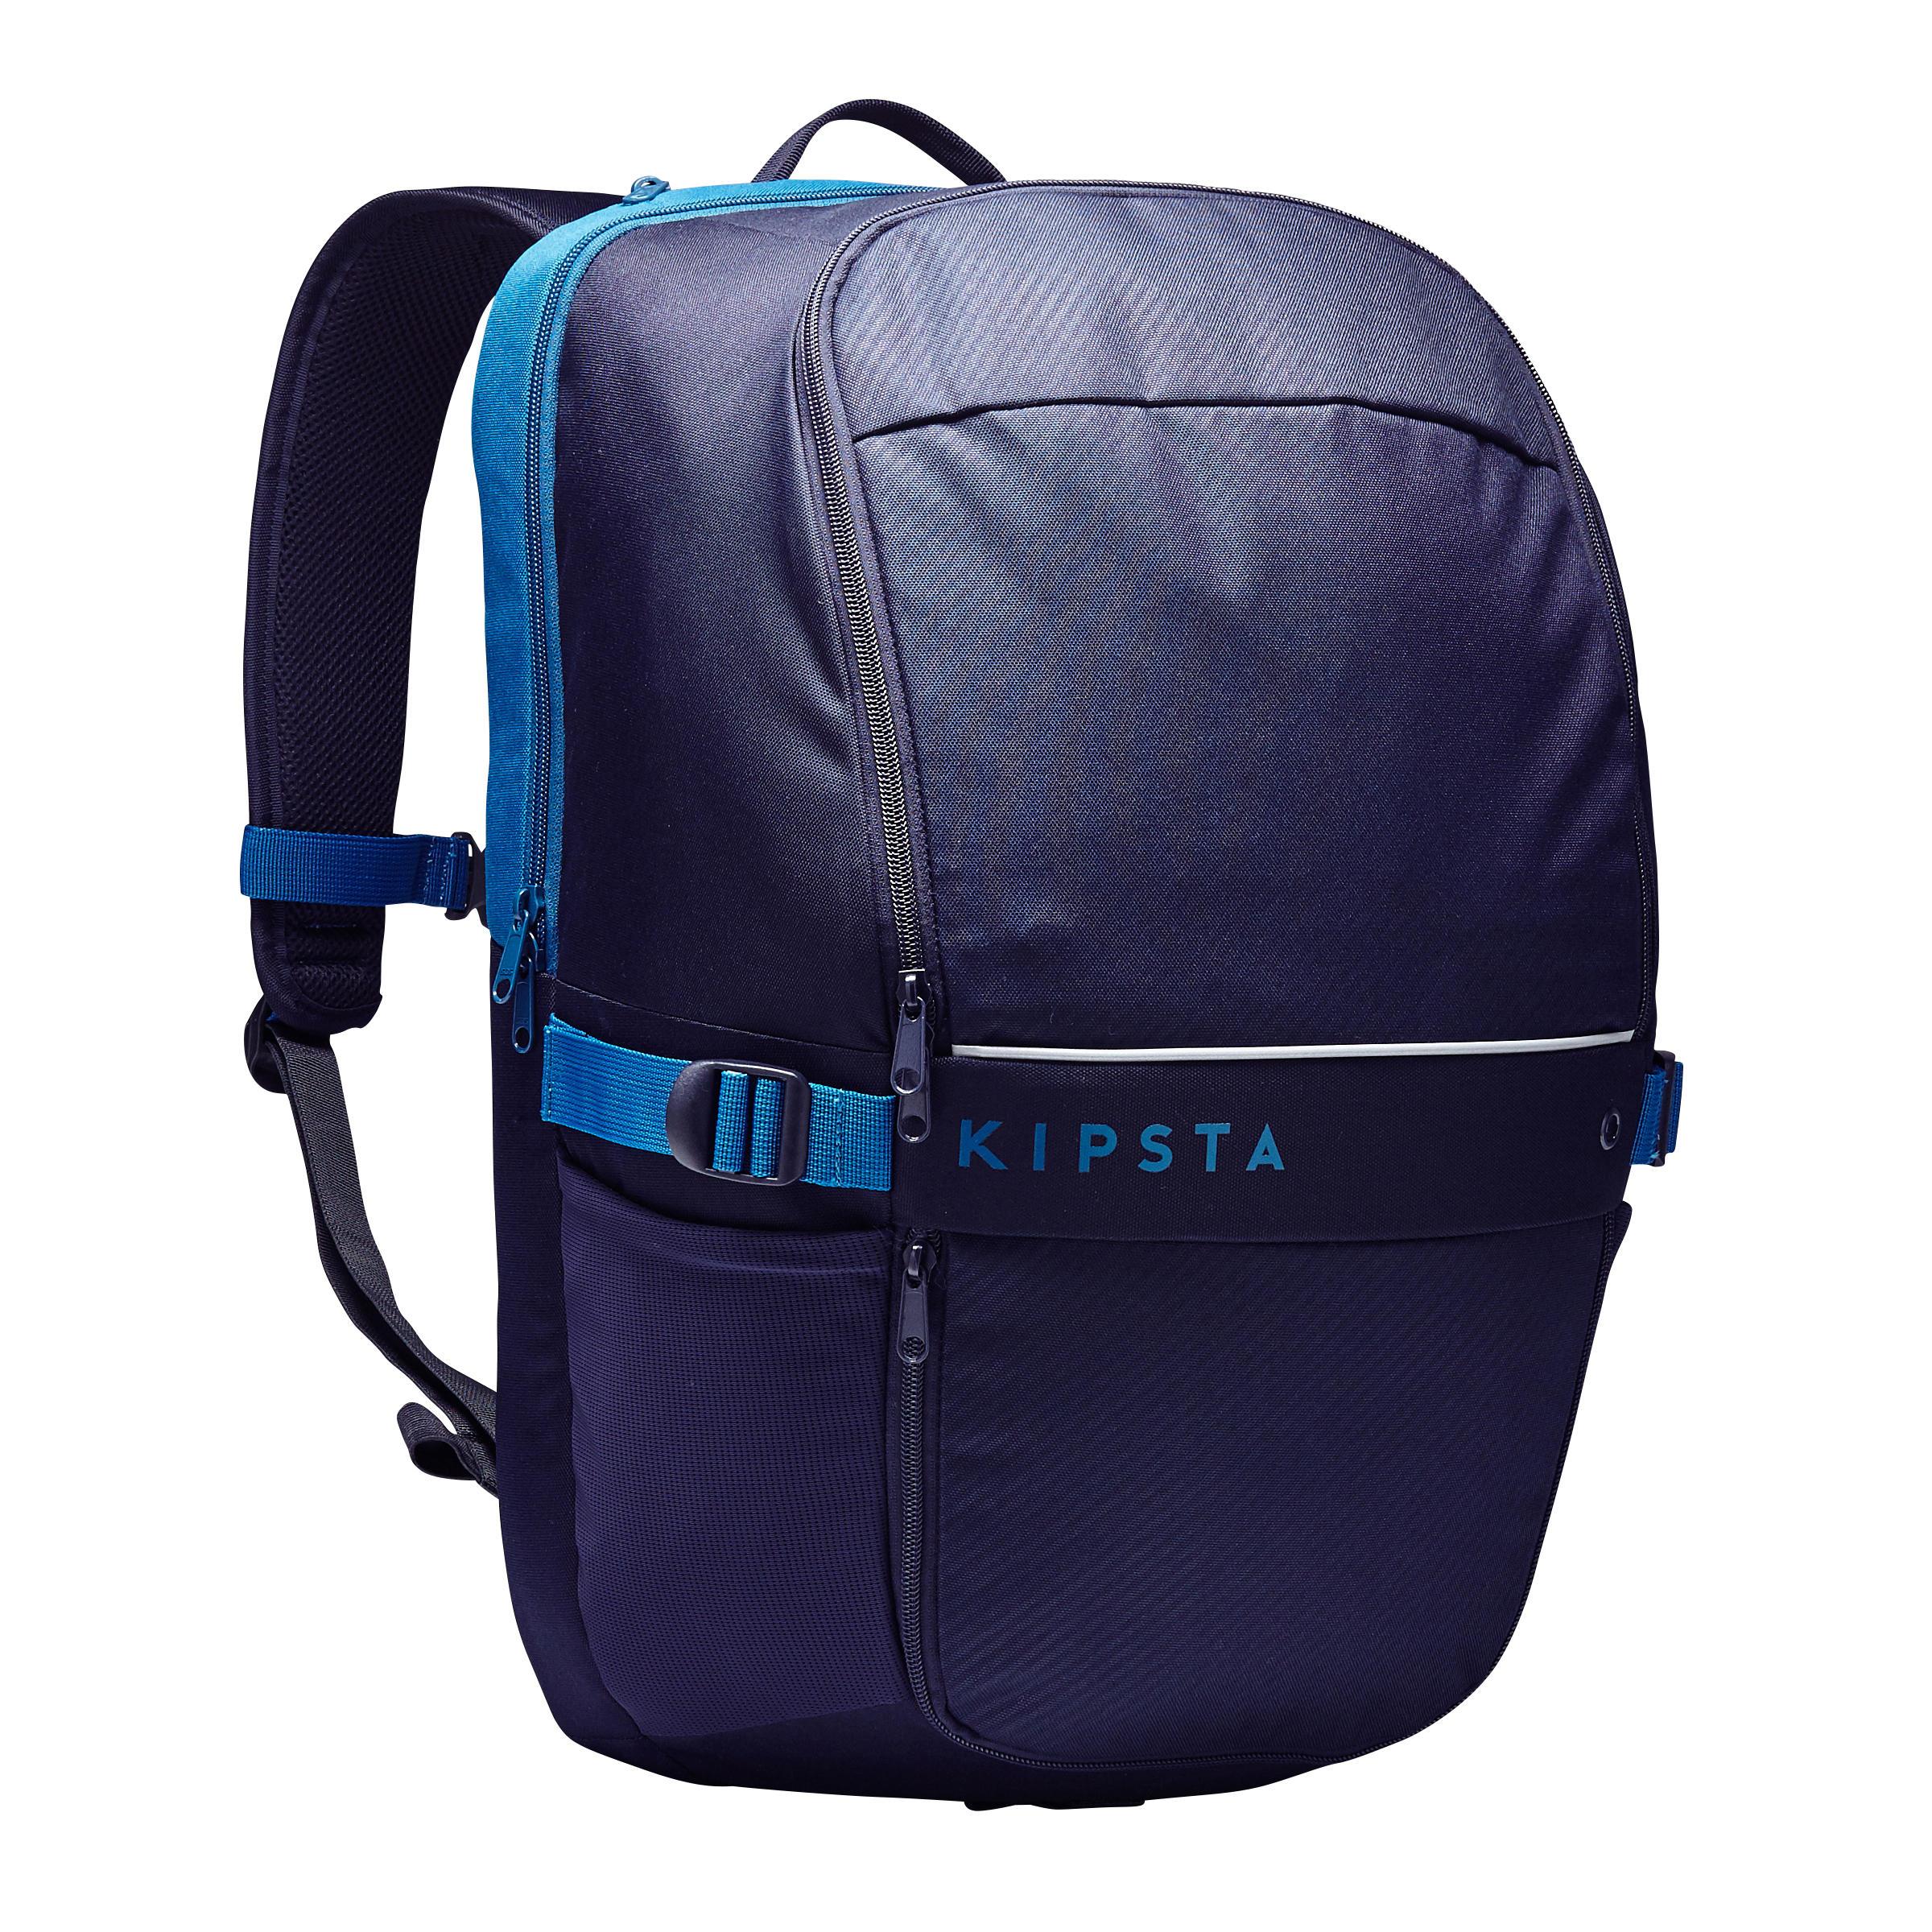 35L Team Sports Backpack Essential - Black/Carbon Grey